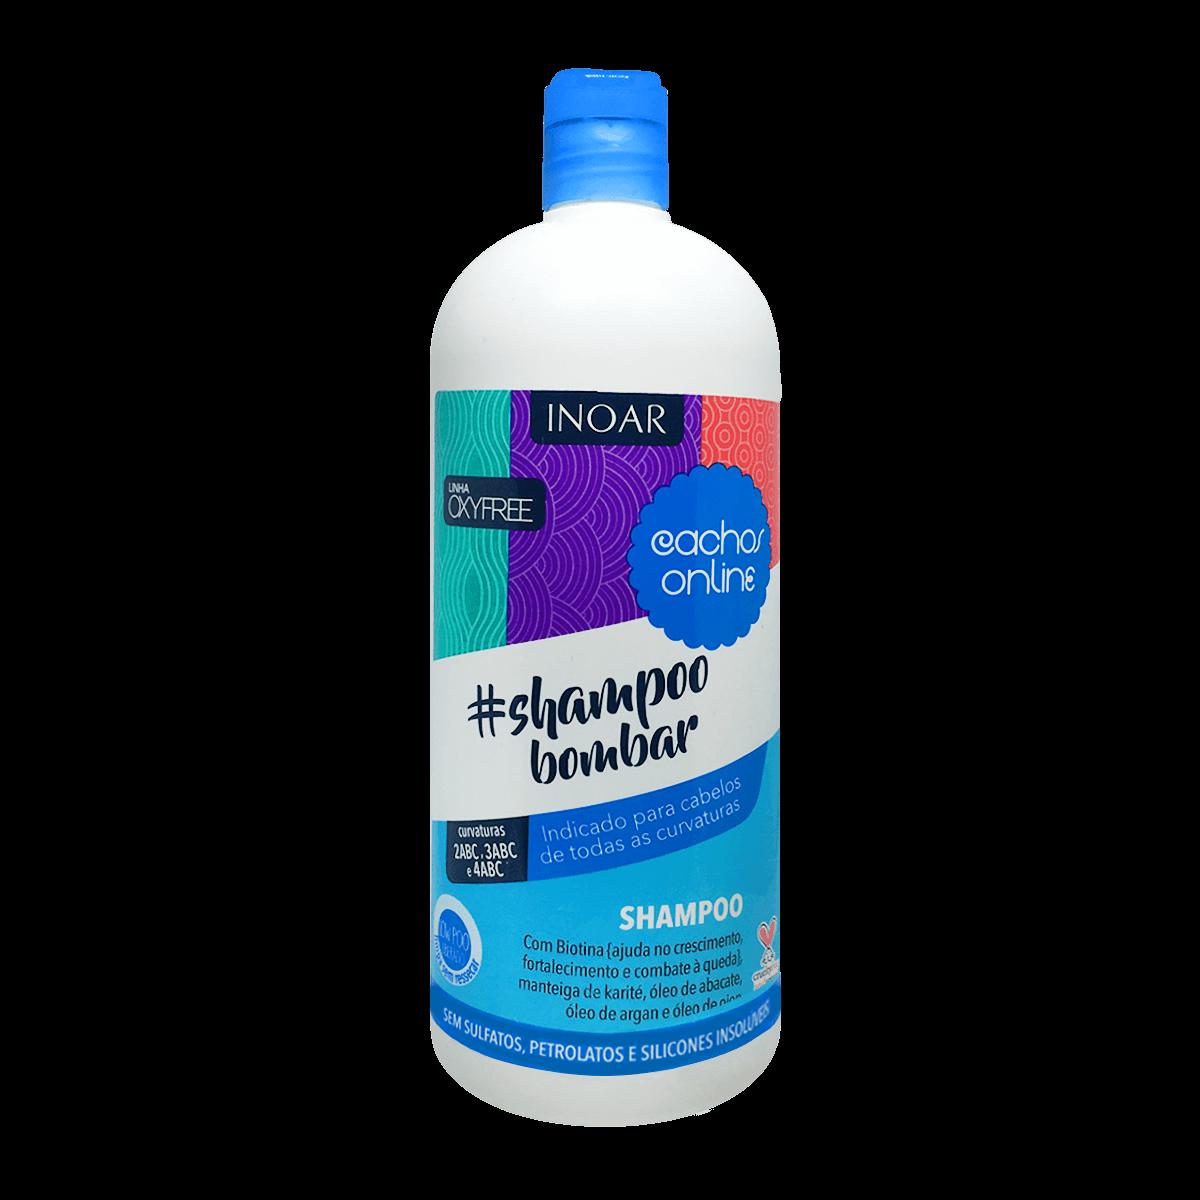 Inoar Shampoo Bombar Cachos Online 1L